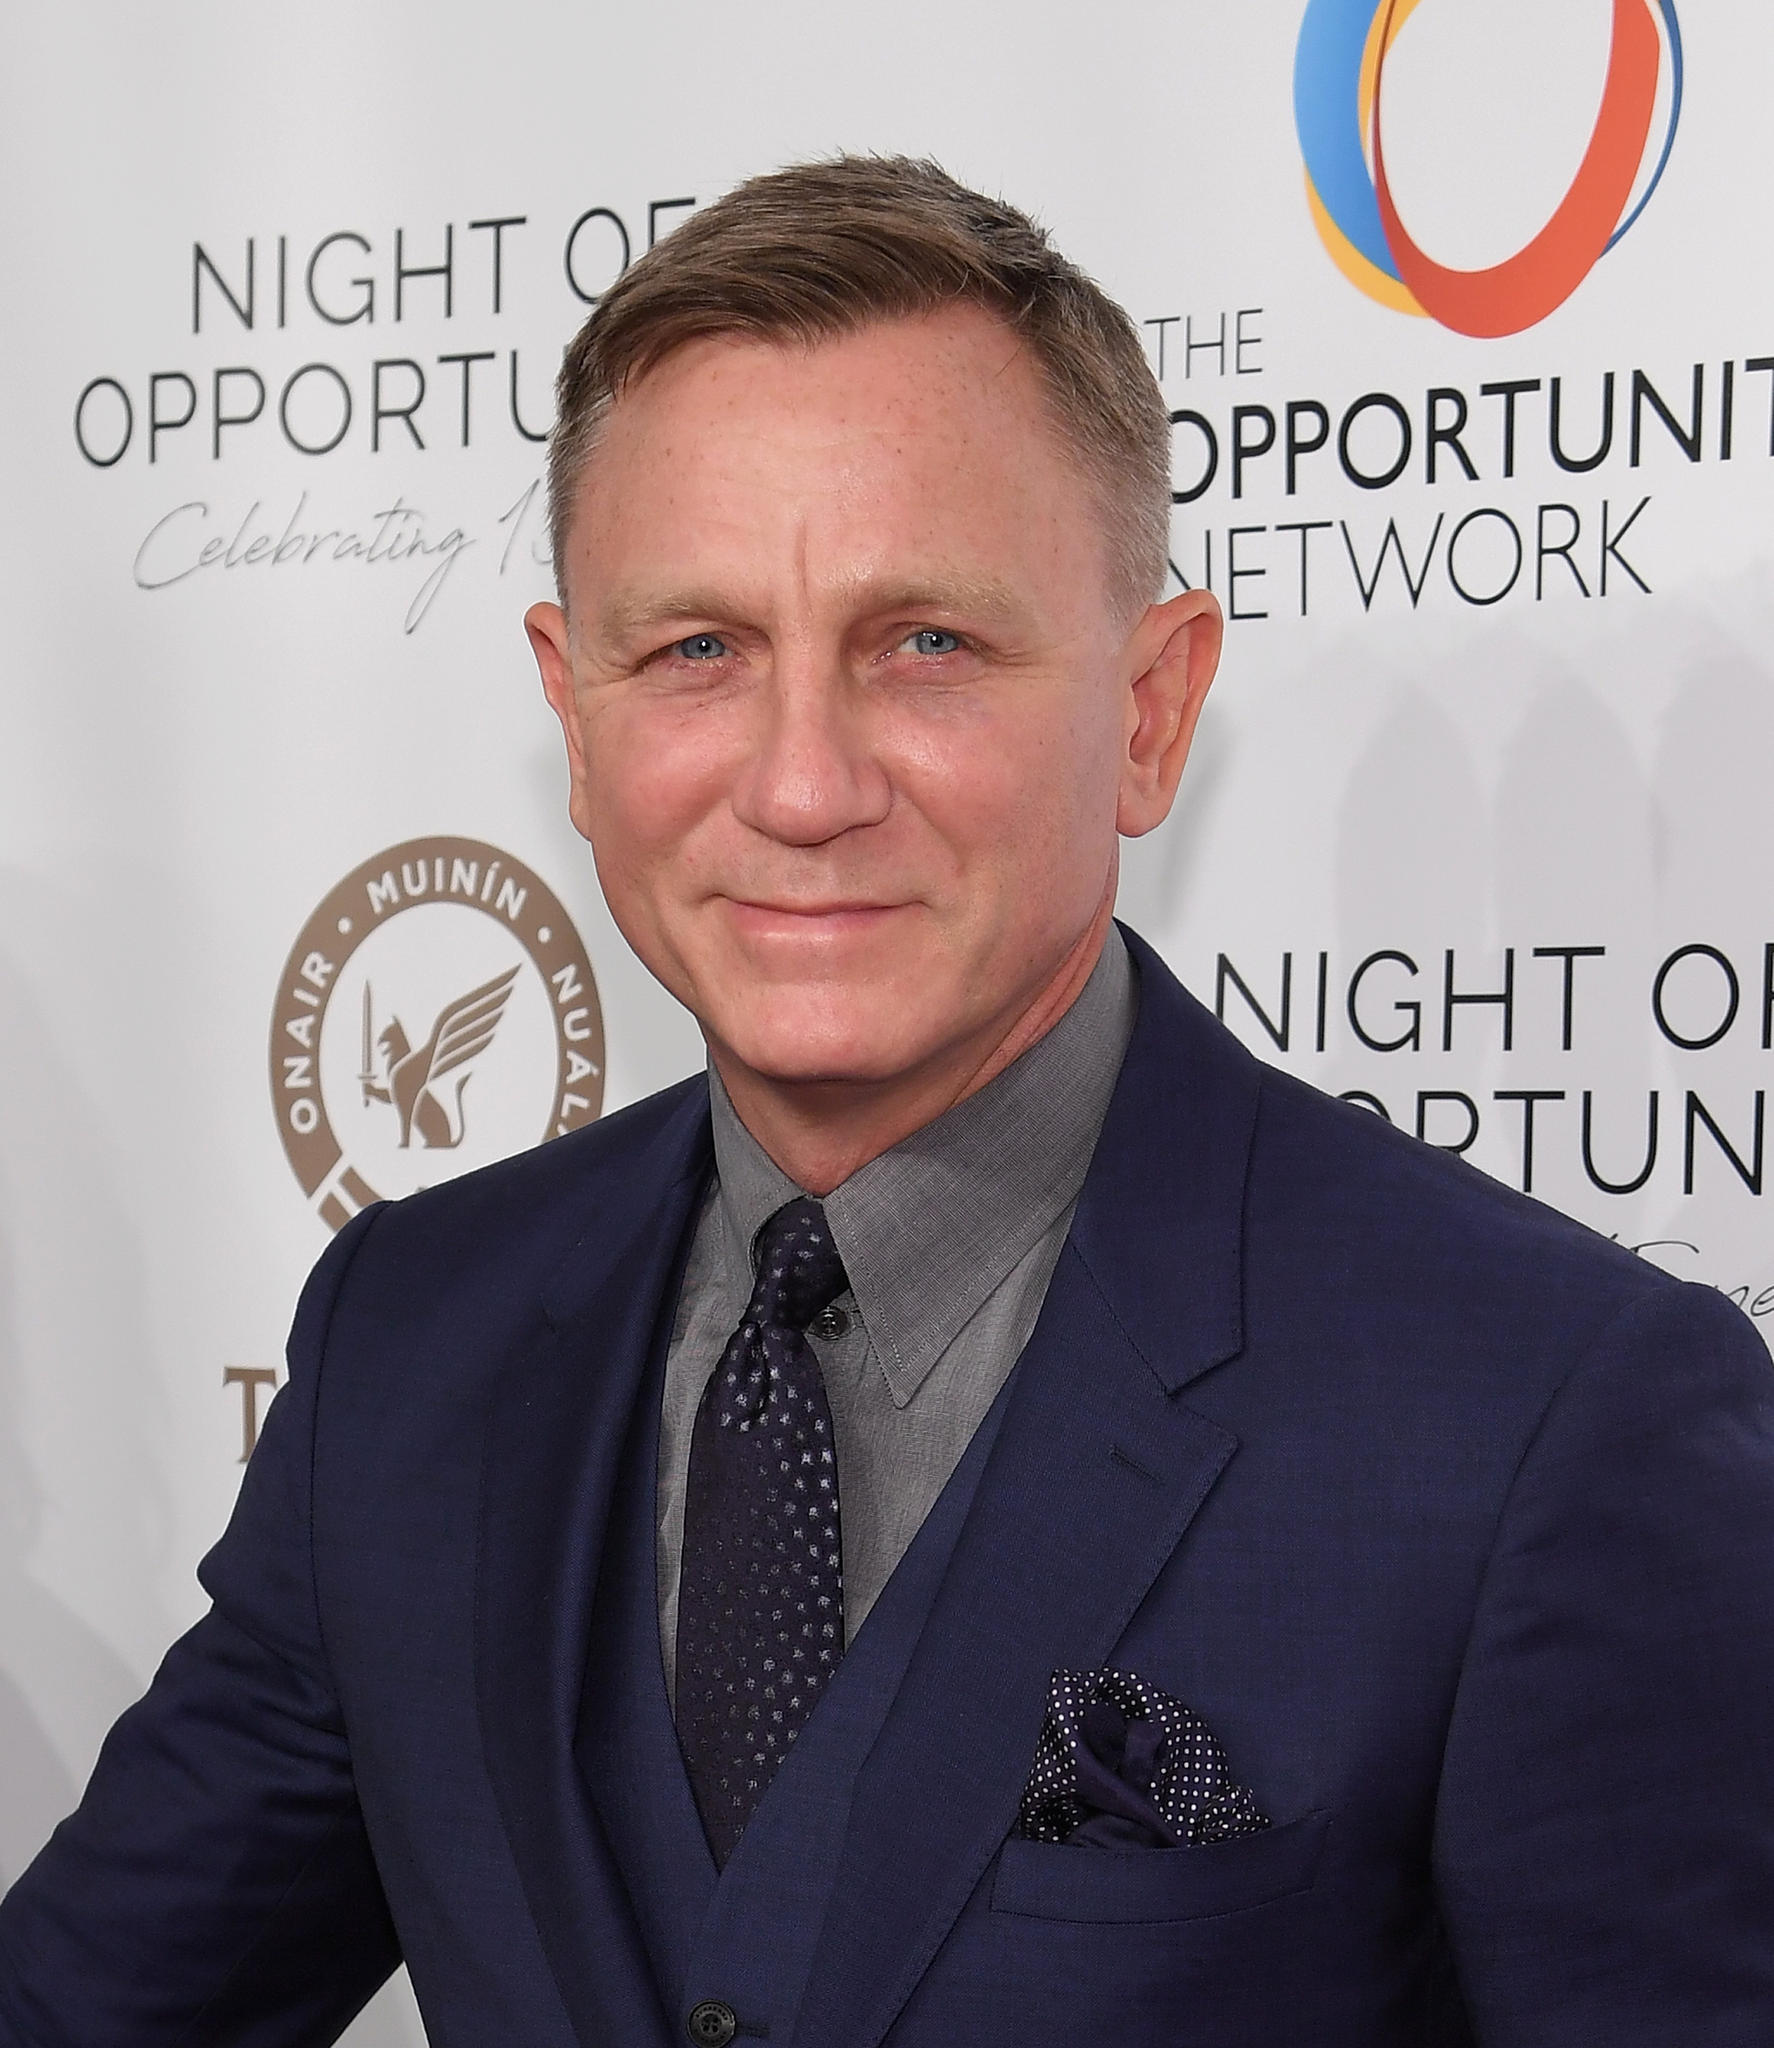 Daniel Craig - Starporträt, News, Bilder